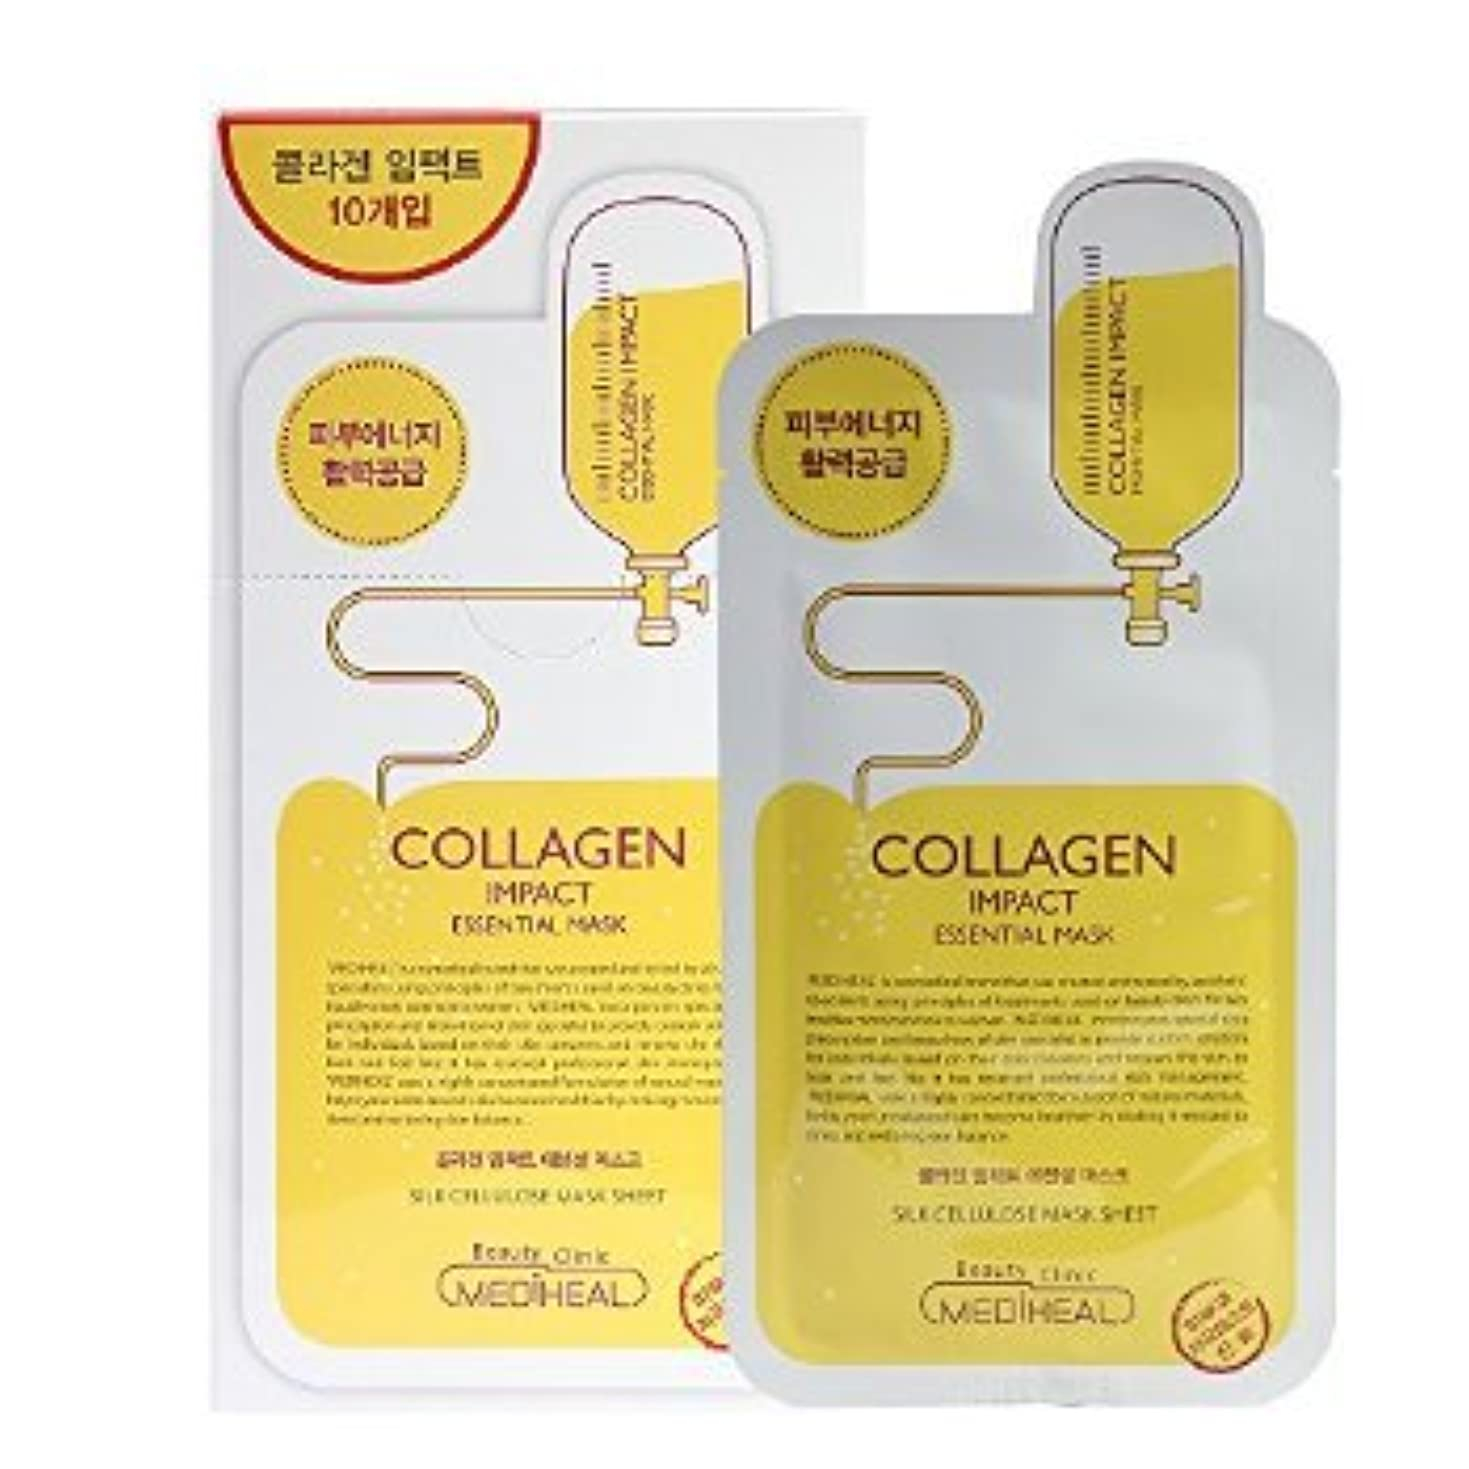 Korea Mediheal Collagen Impact Essential Mask Pack 1box 10sheet